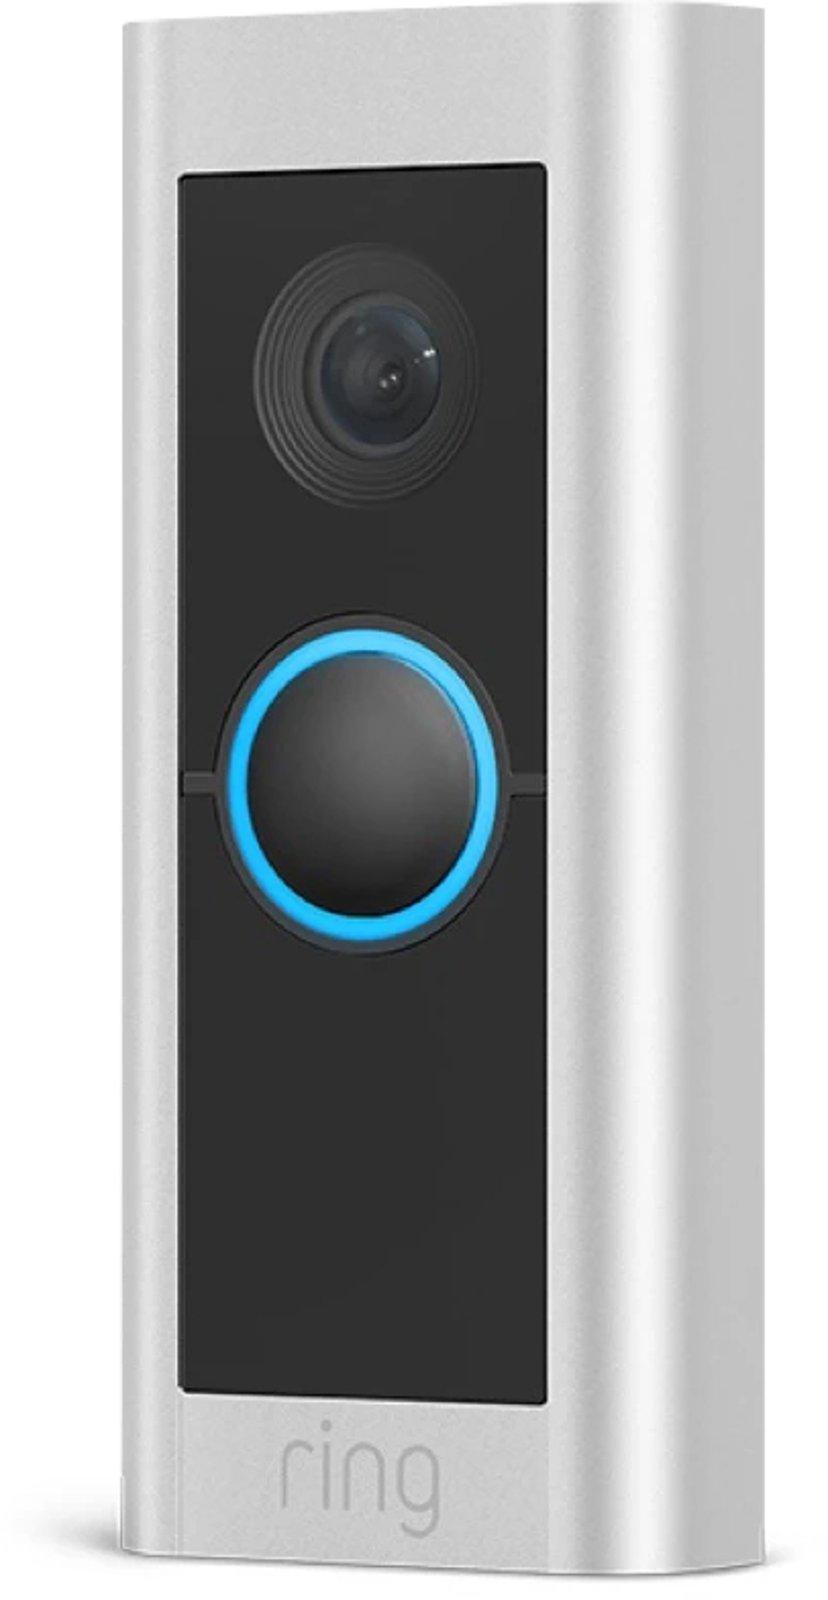 Ring Video Doorbell Pro 2 Plug-in Adapter